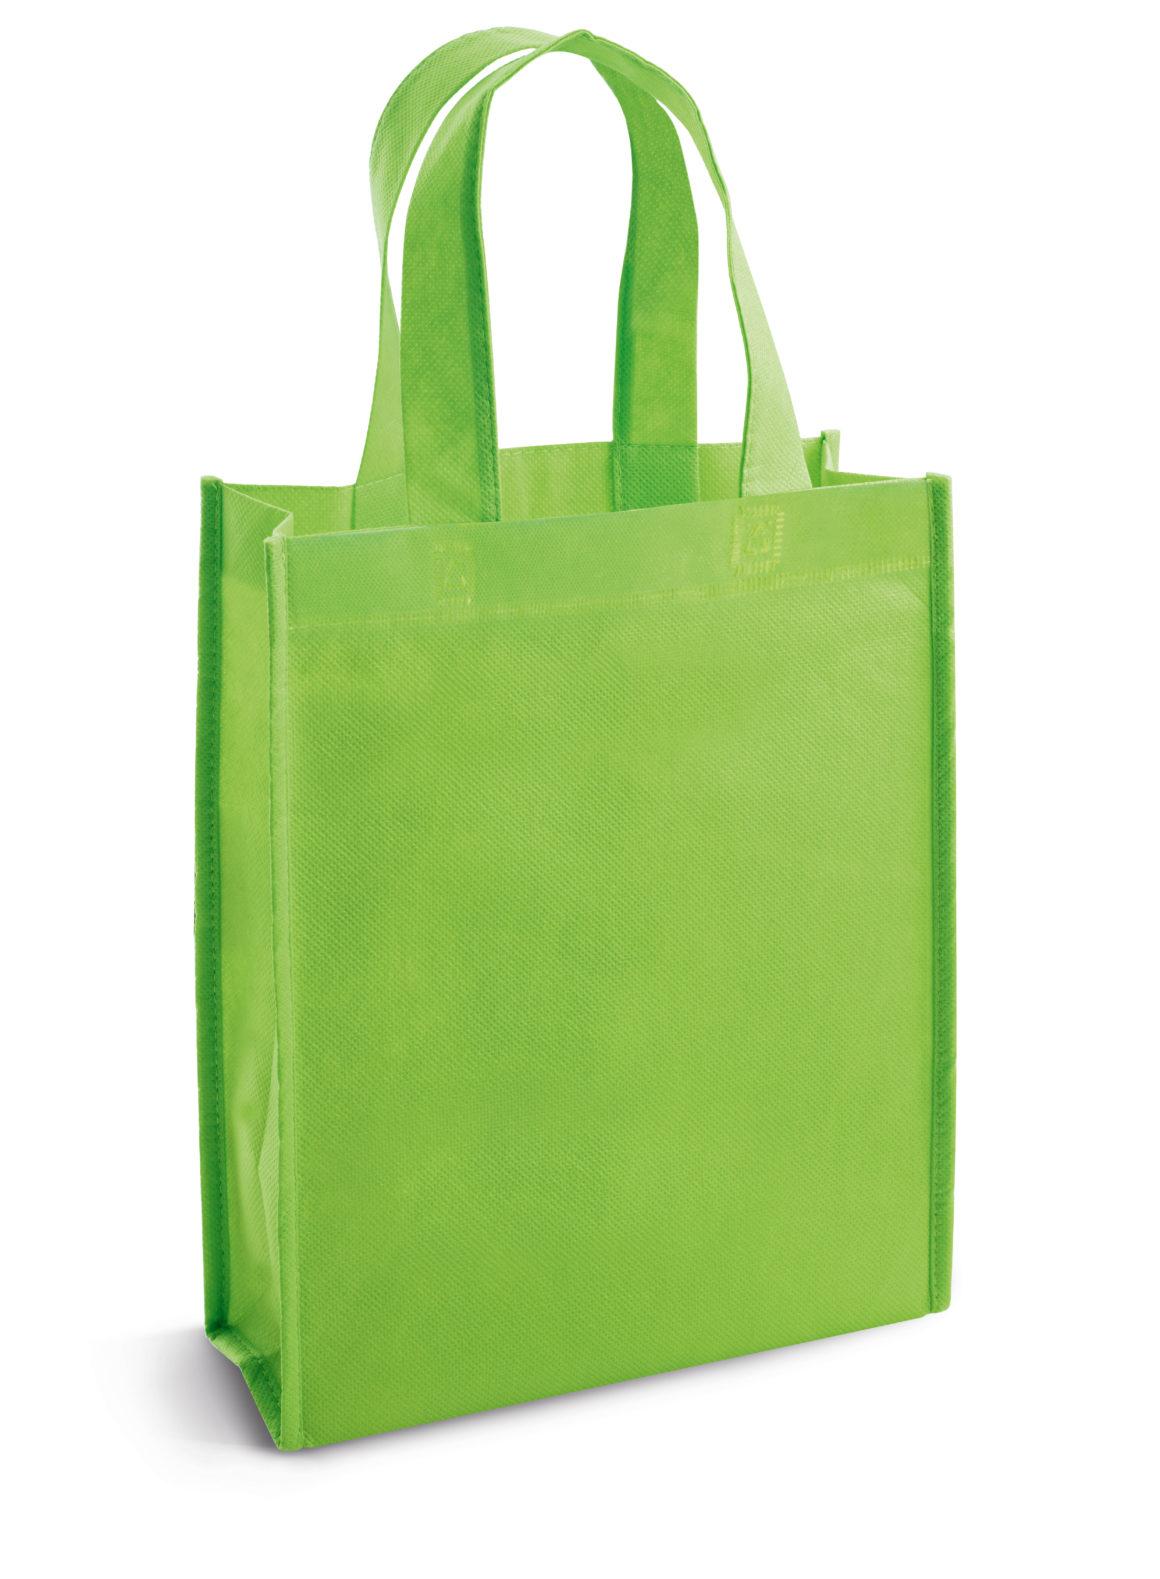 Cubert Eco friendly Bag Product Code GP92840